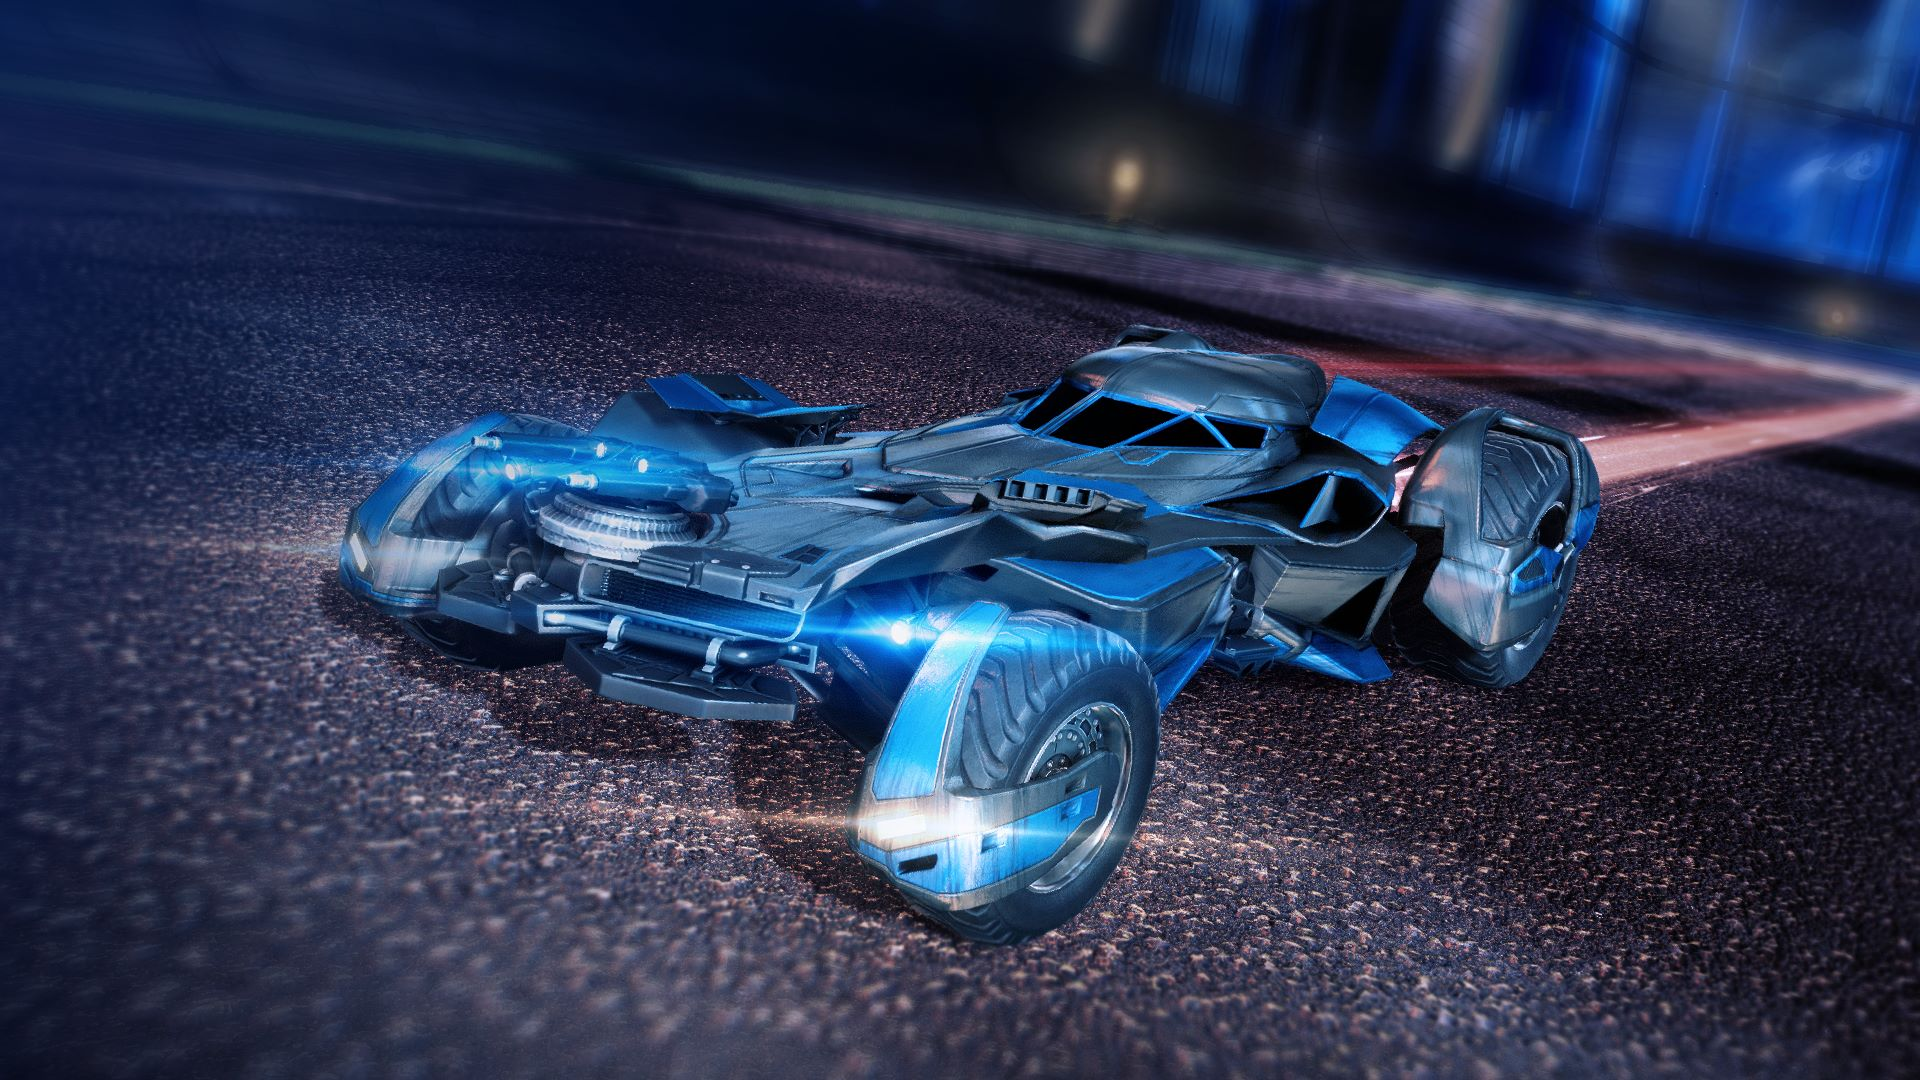 Rocket League -... Xbox 360 Controller Skins Gold